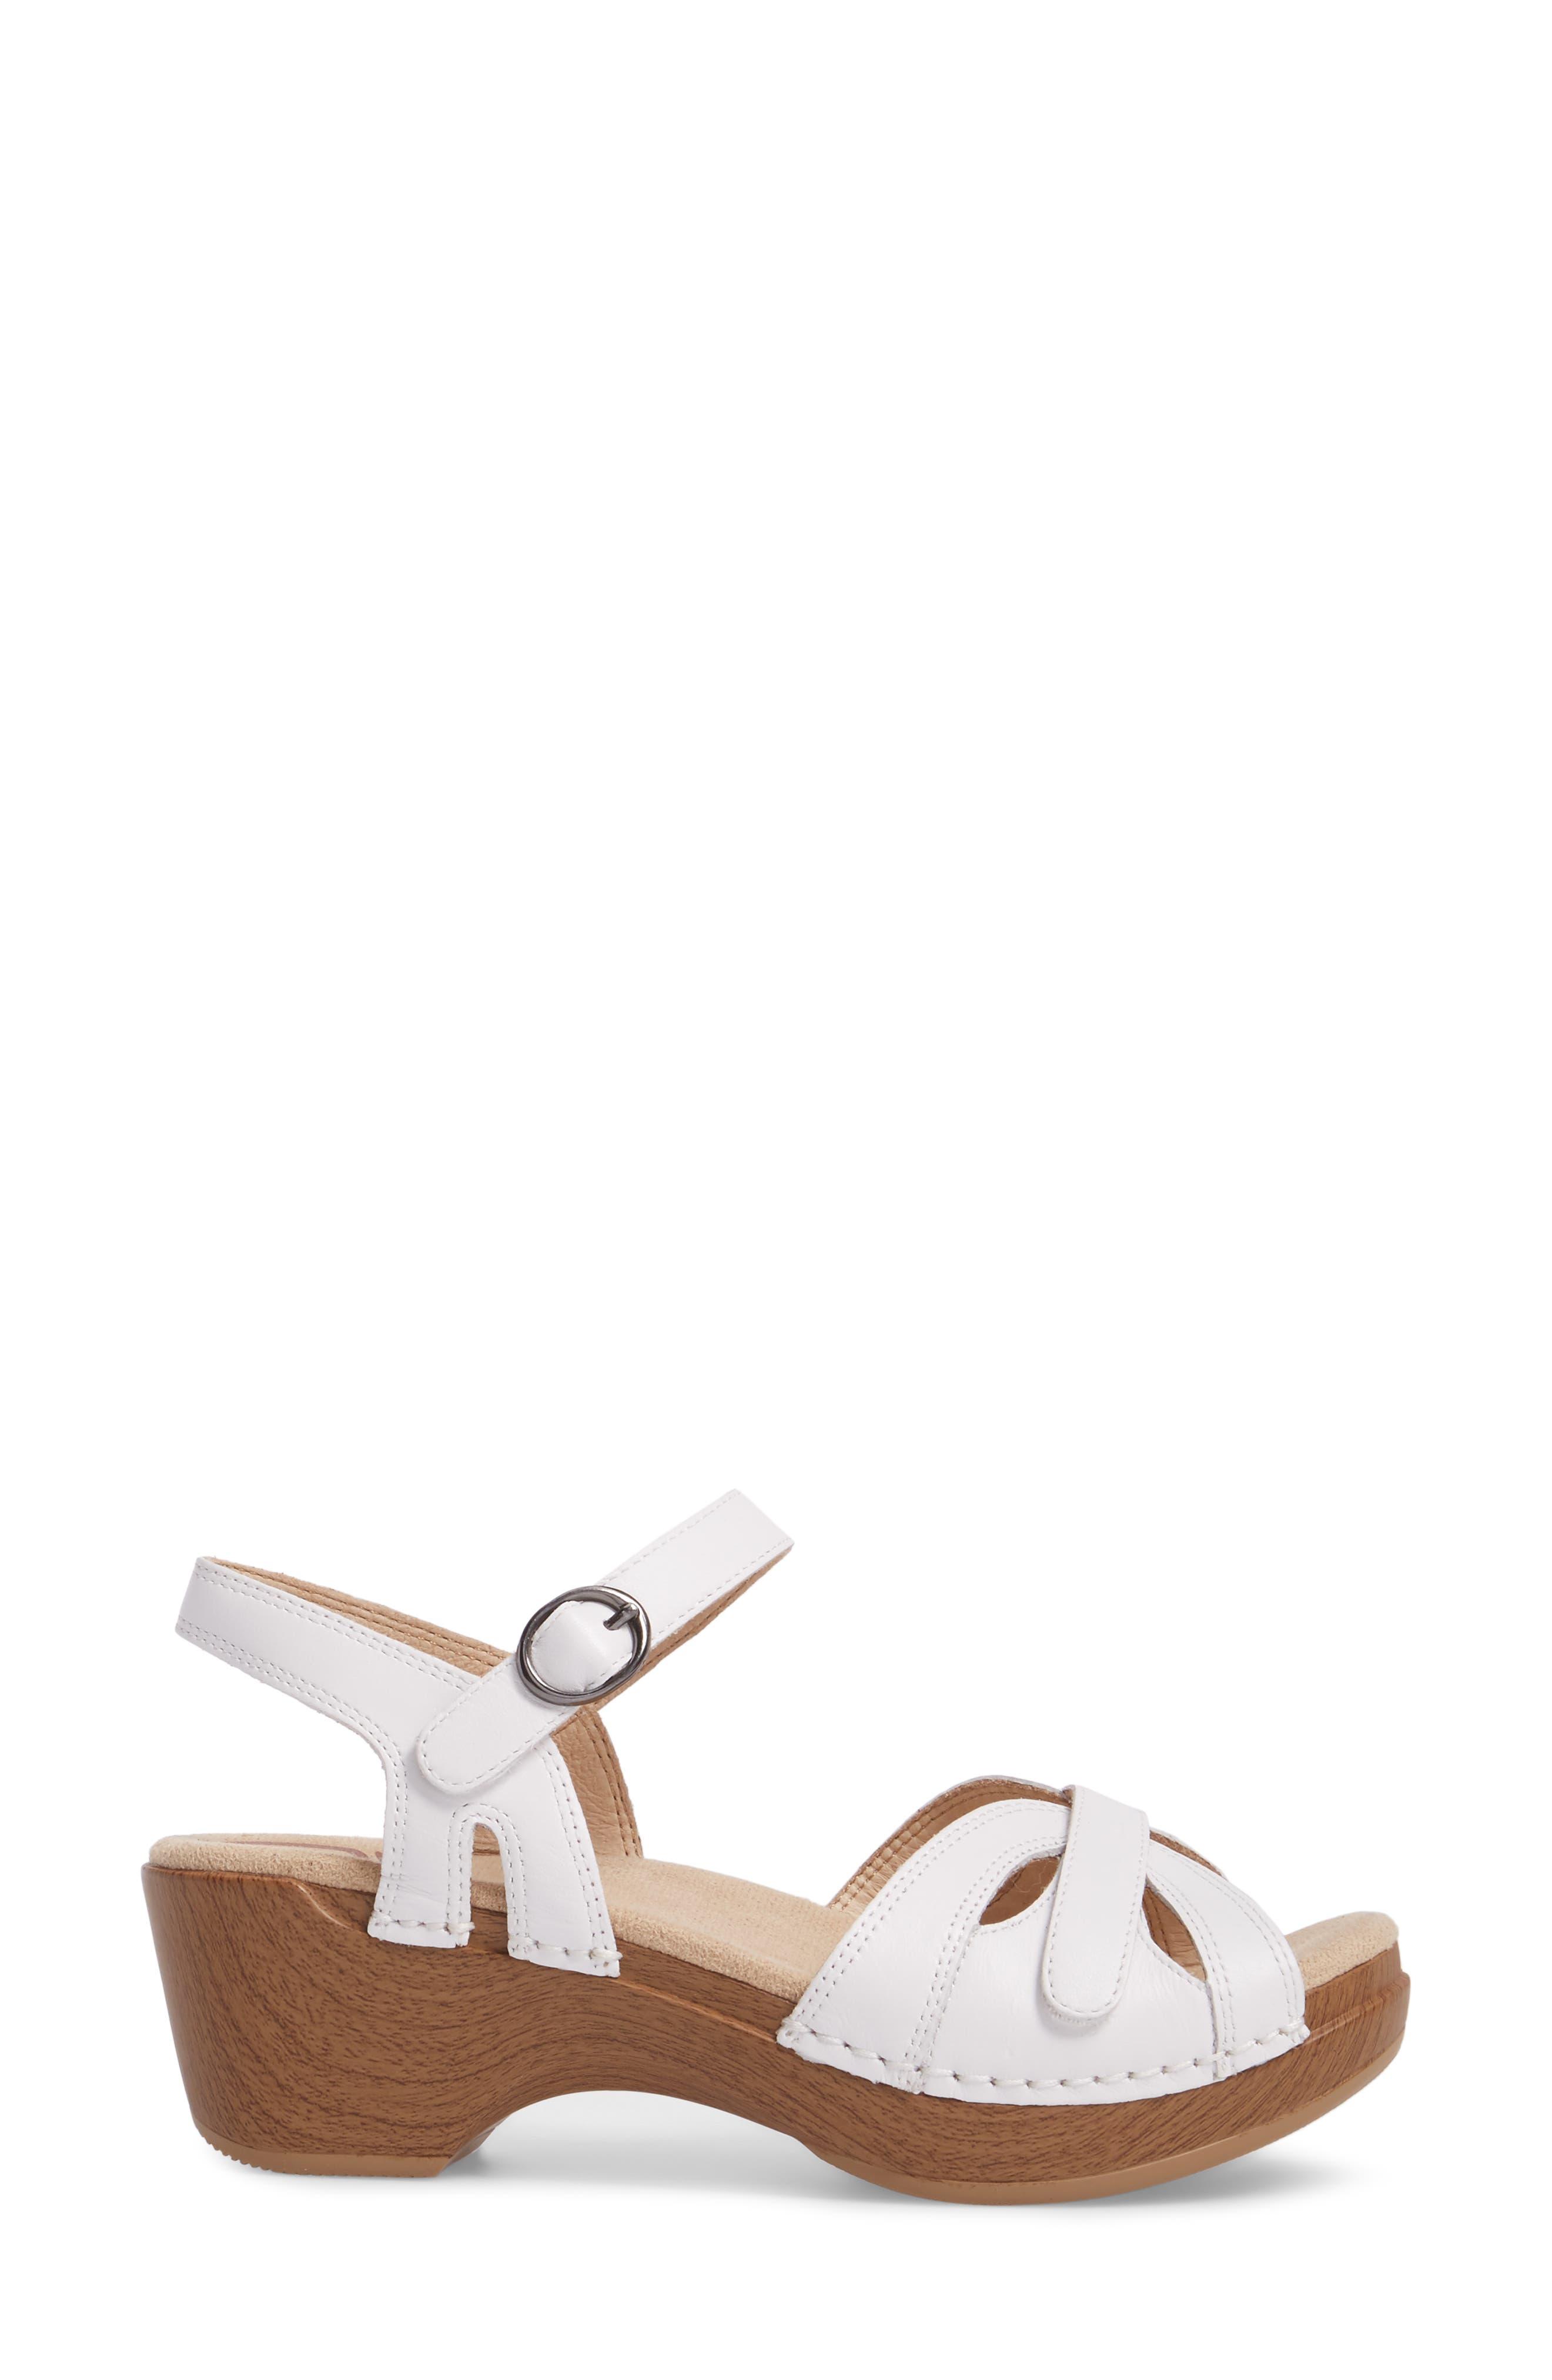 Season Sandal,                             Alternate thumbnail 3, color,                             White Leather